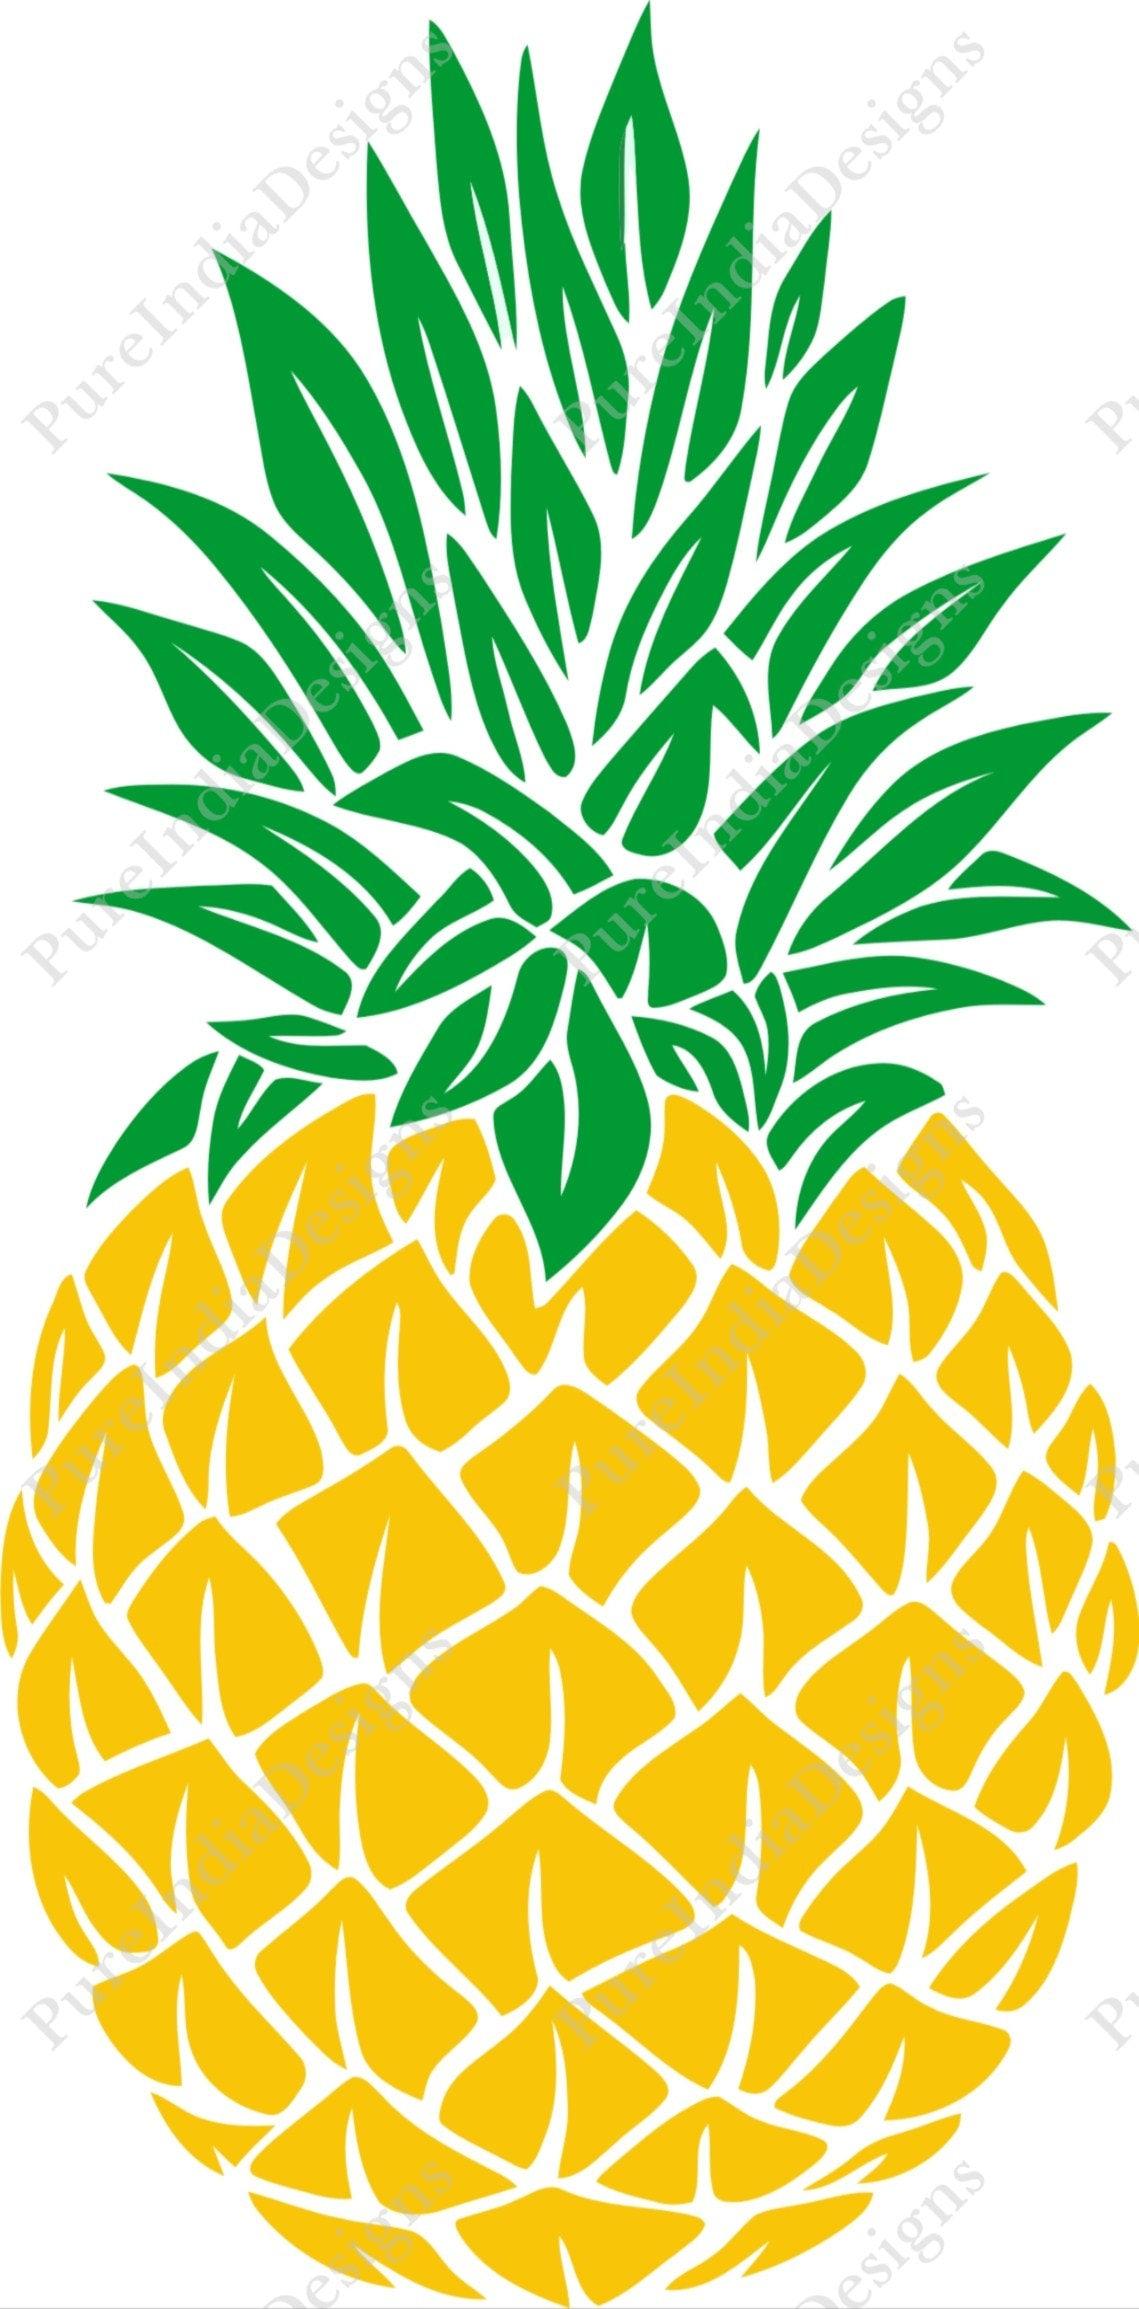 Download Pineapple SVG Pineapple Monogram SVG SVG Files Cricut Cut